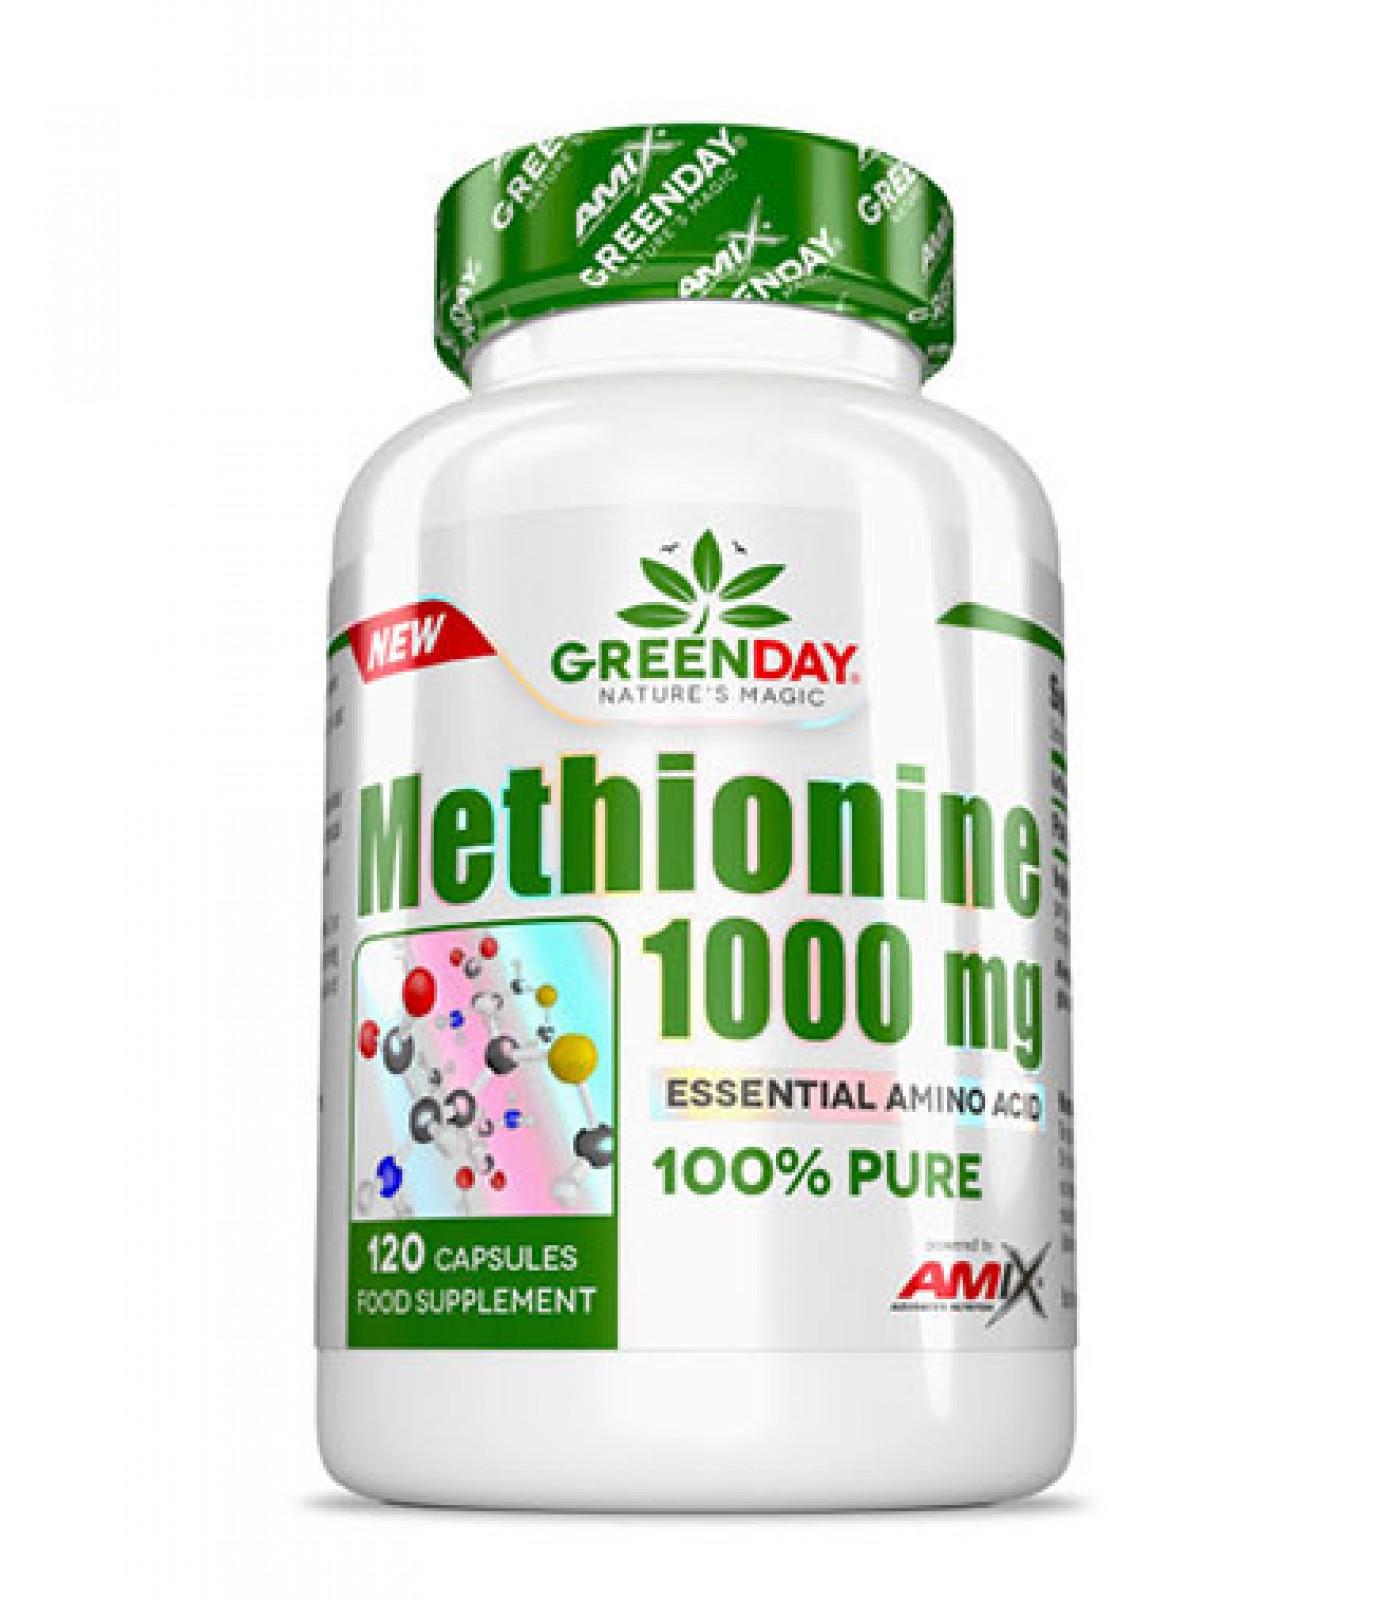 AMIX GreenDay METHIONINE 1000 mg / 120 Caps.